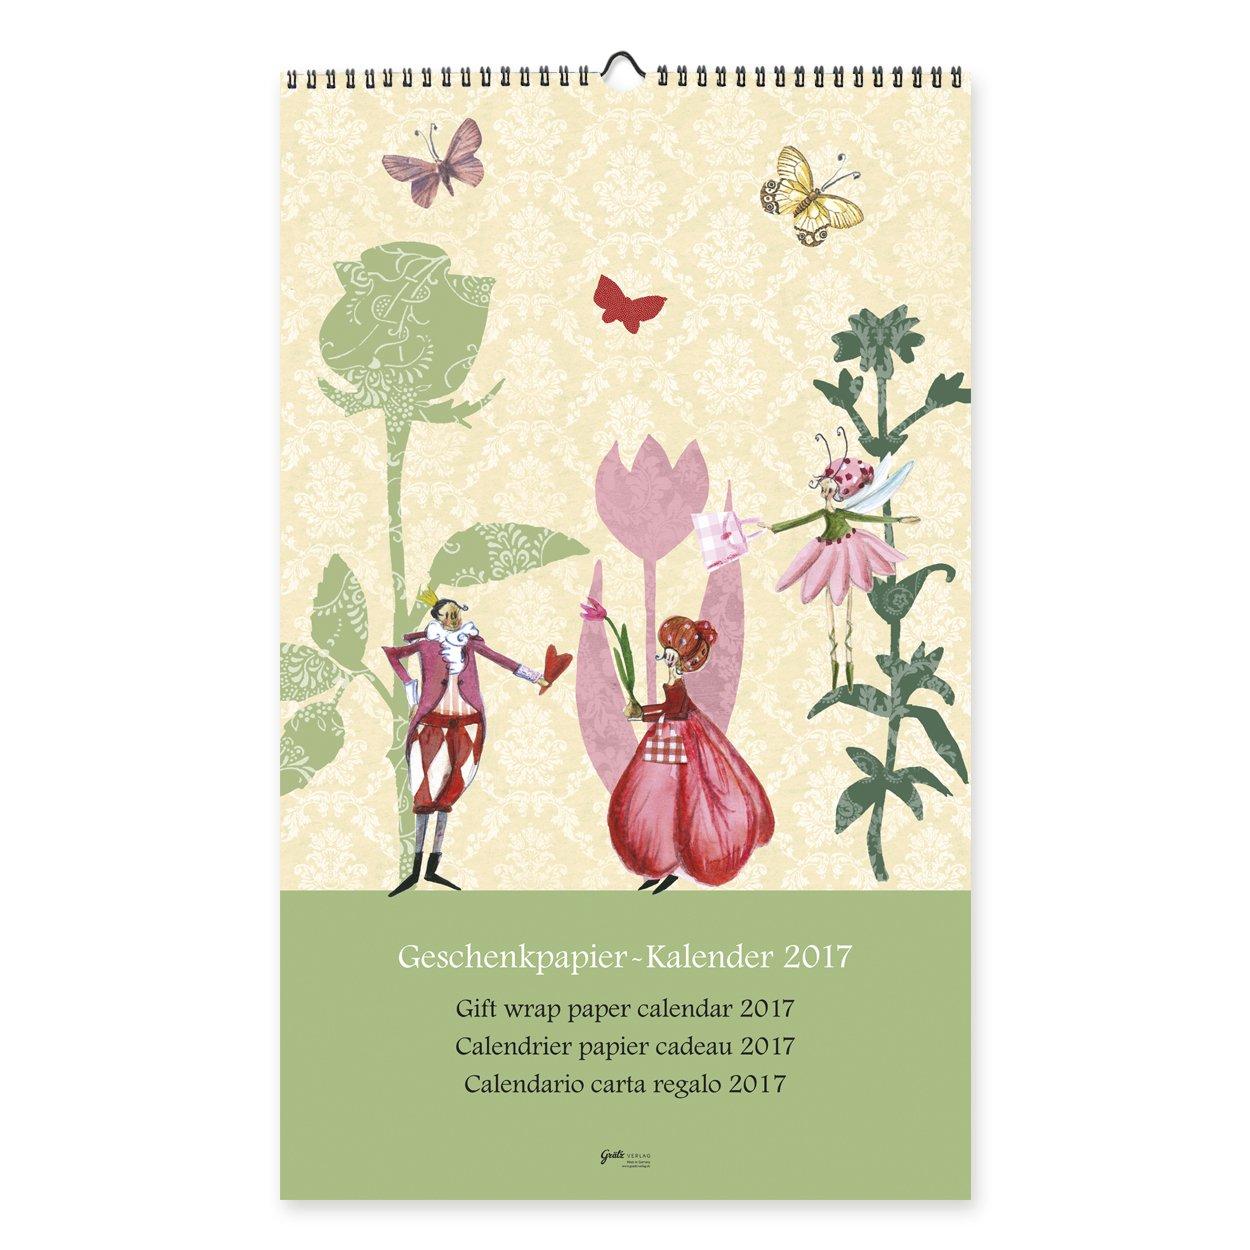 Geschenkpapier-Kalender 2017